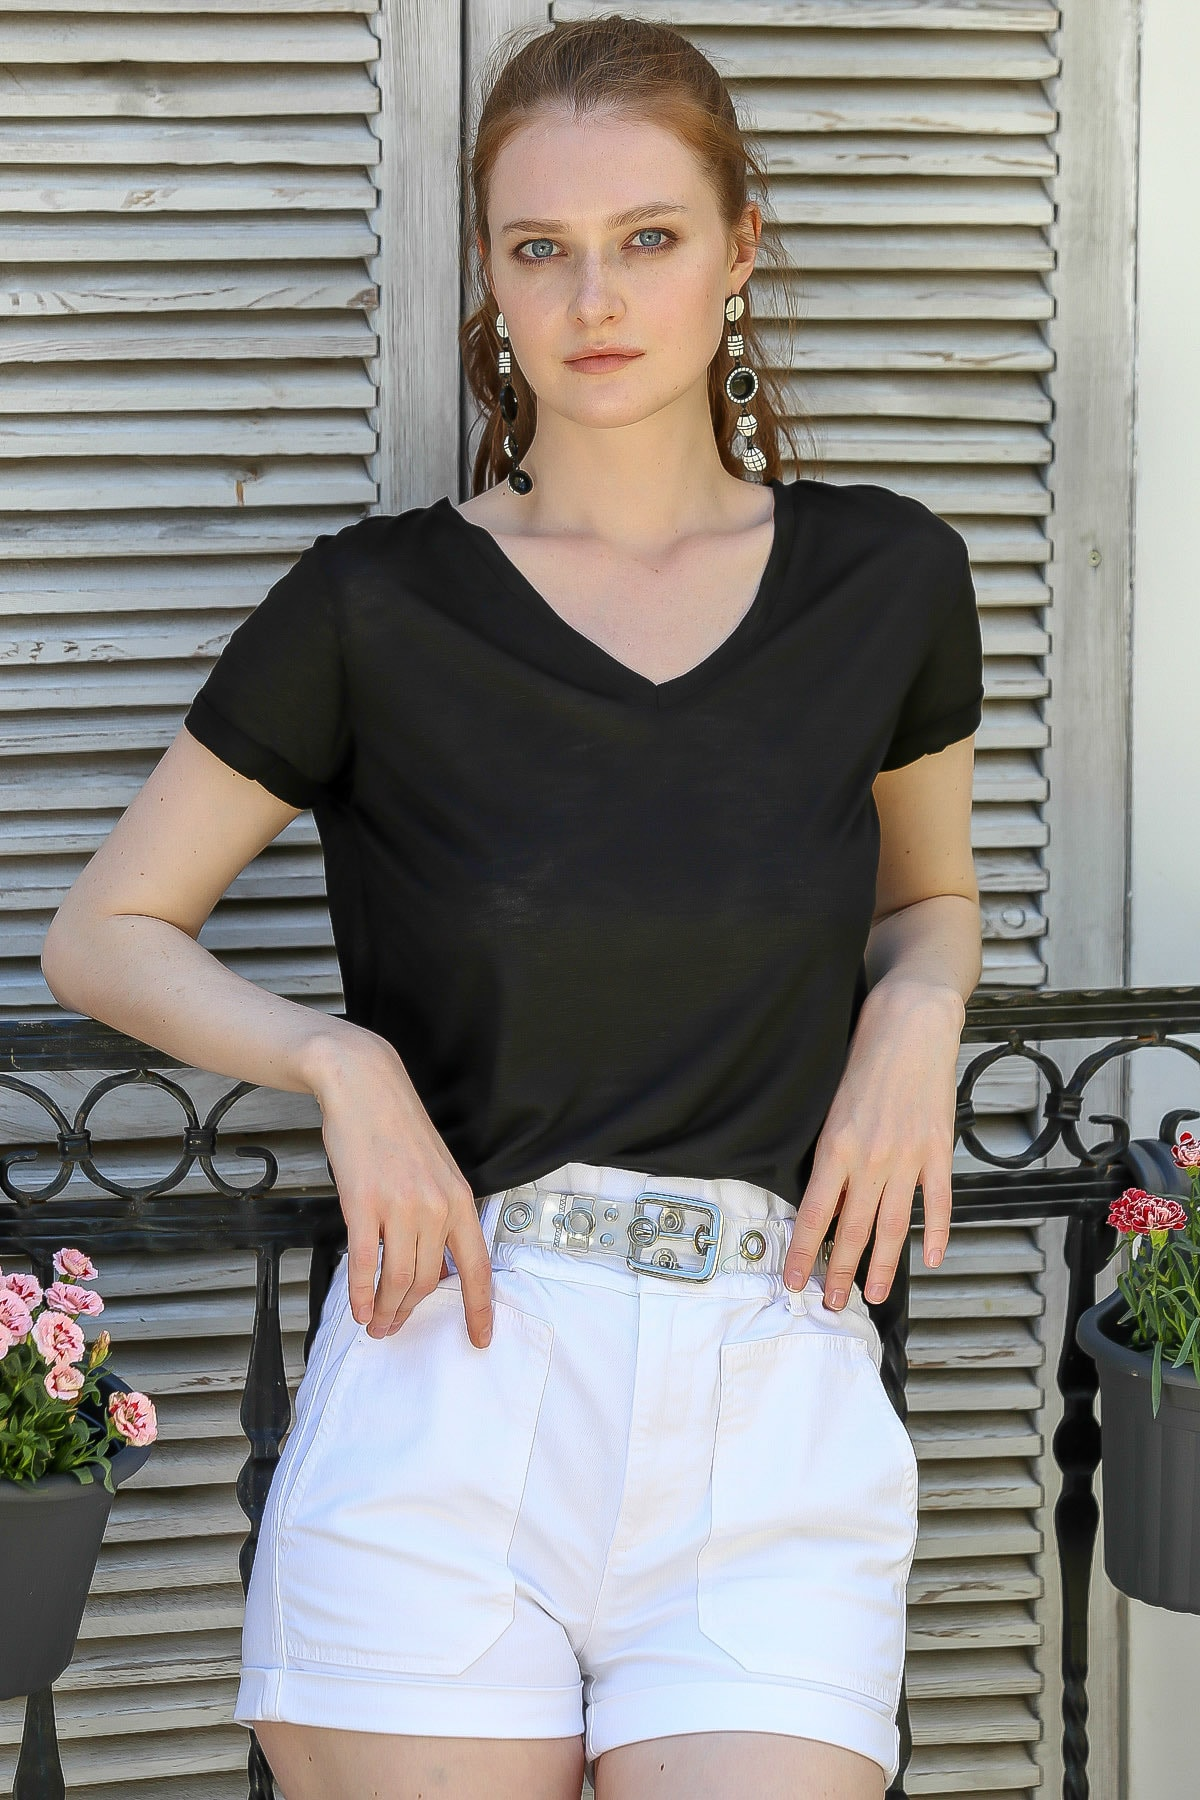 Chiccy Kadın Siyah Casual V Yaka Salaş T-Shirt M10010300Ts98166